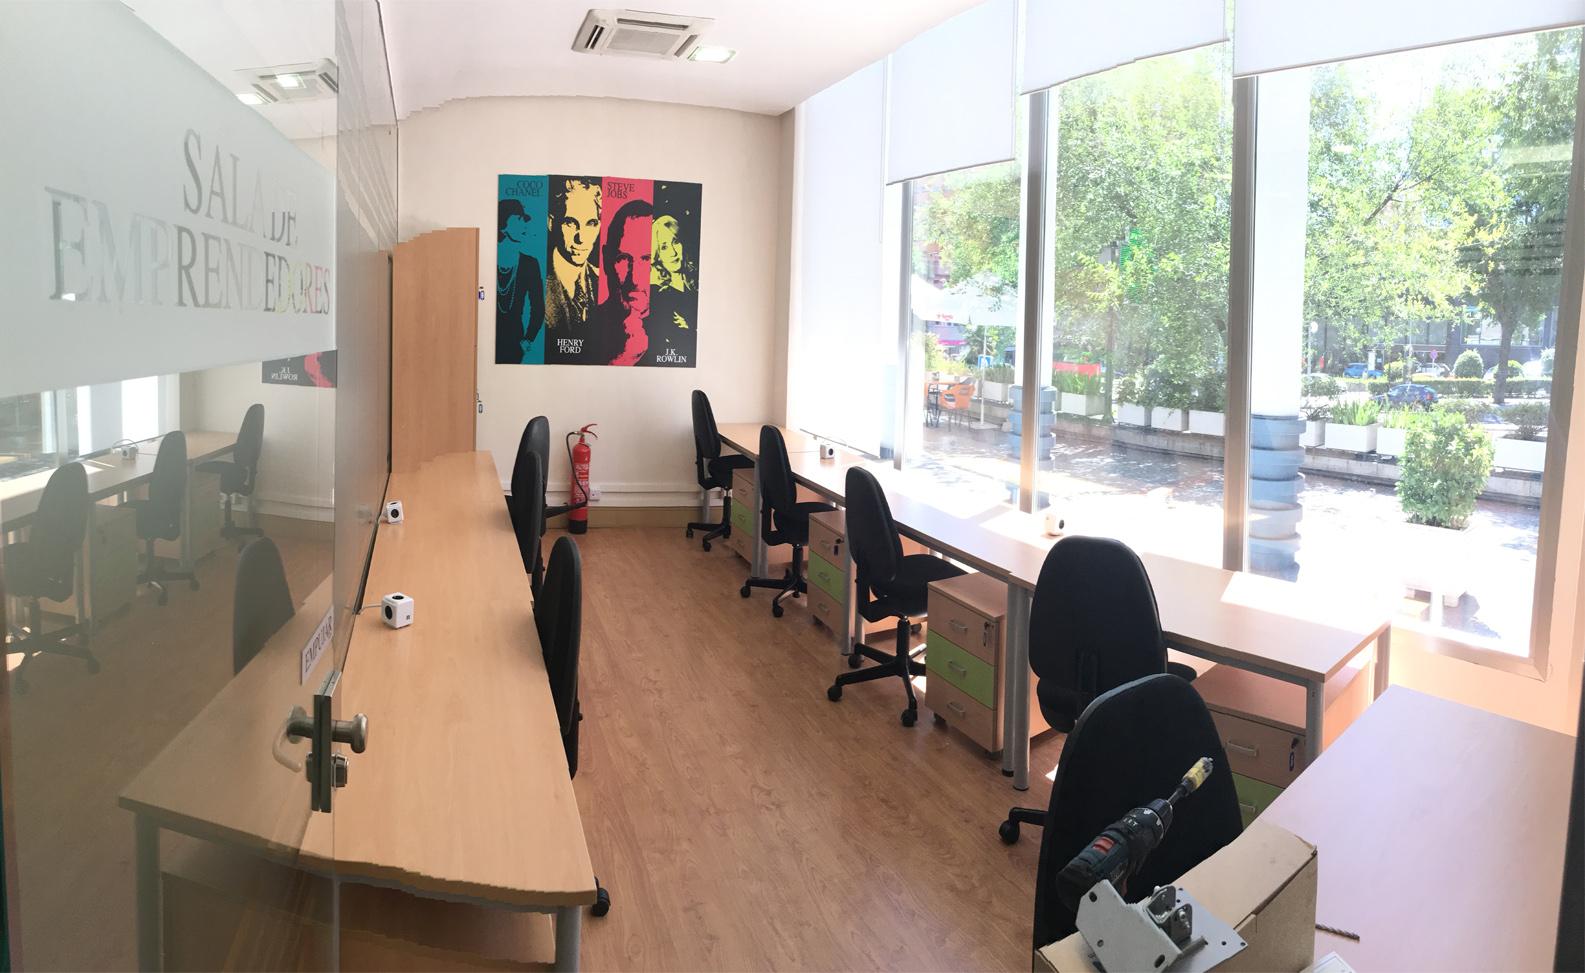 sala emprendedores